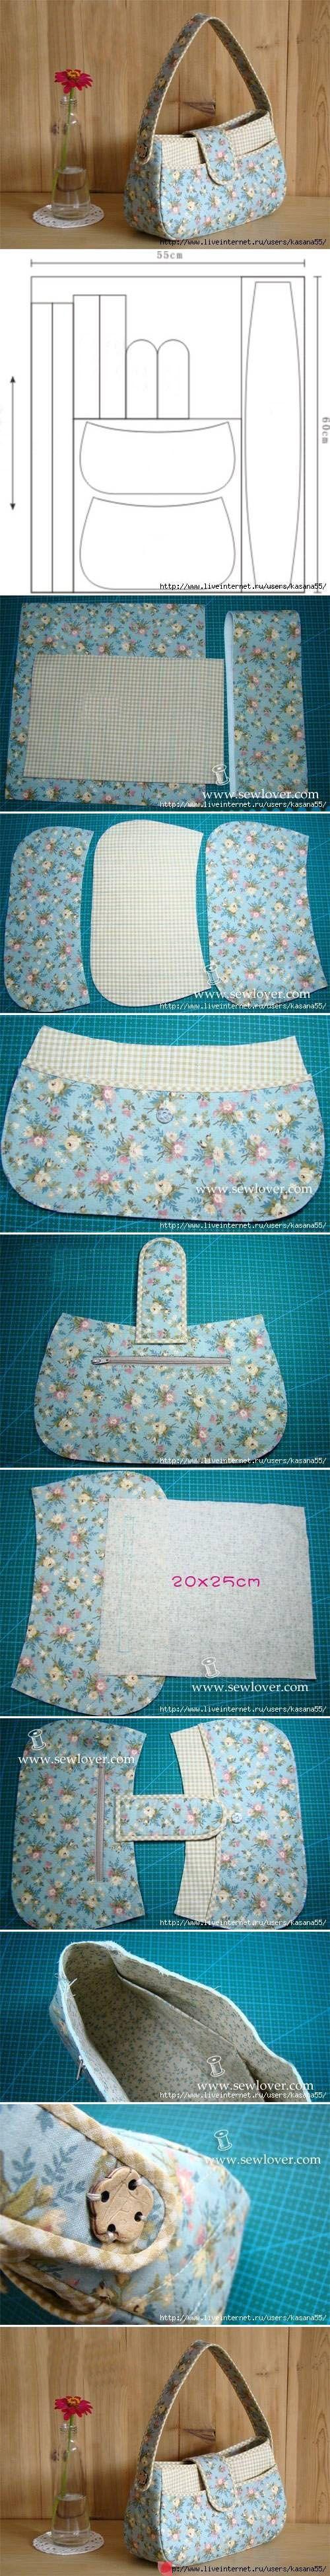 Miniature Bag Tutorial